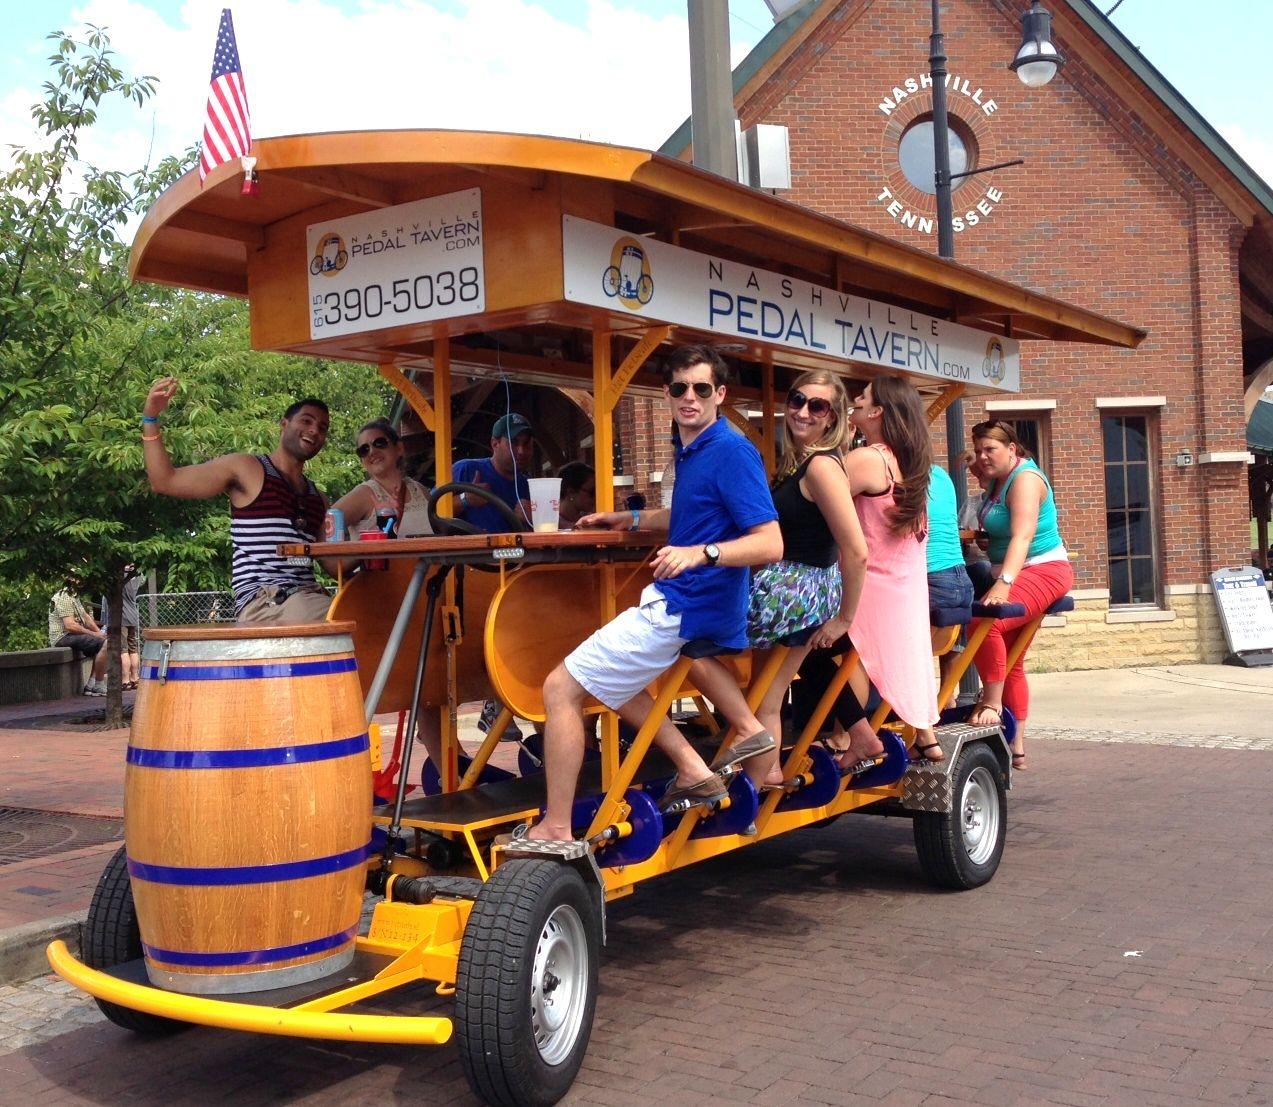 Traveling Peddle Bar Pedal Tavern Free Bikes Among Many Ways To Explore Downtown Nashville Pedal Tavern Nashville Vacation Nashville Trip